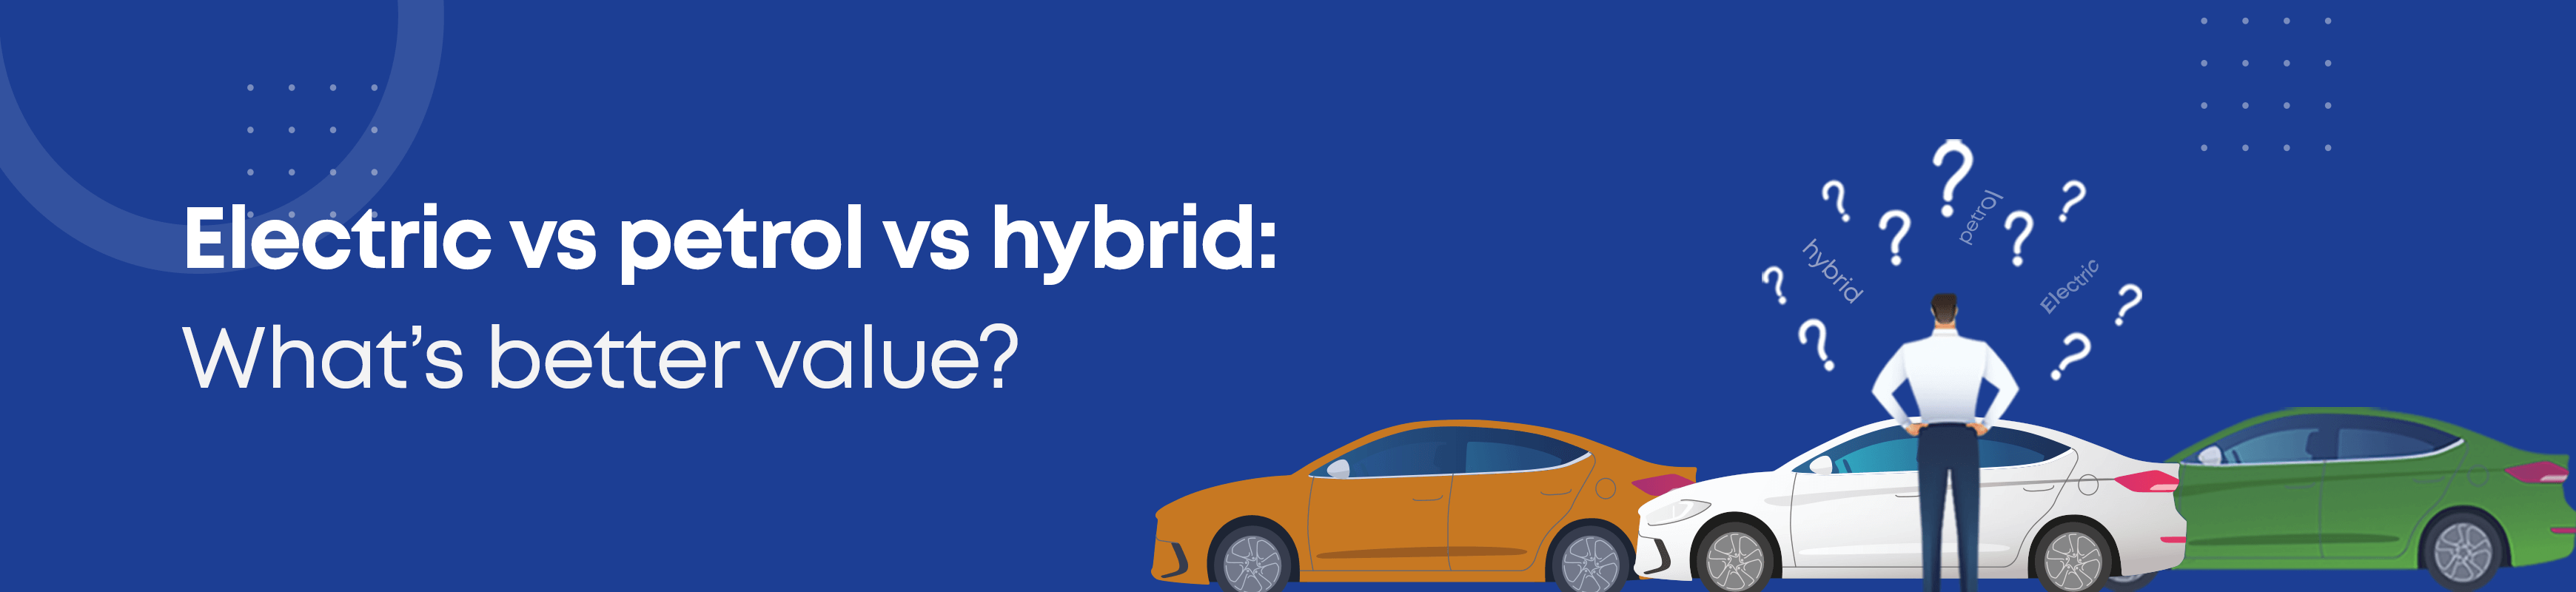 Electric vs Petrol vs Hybrid header image